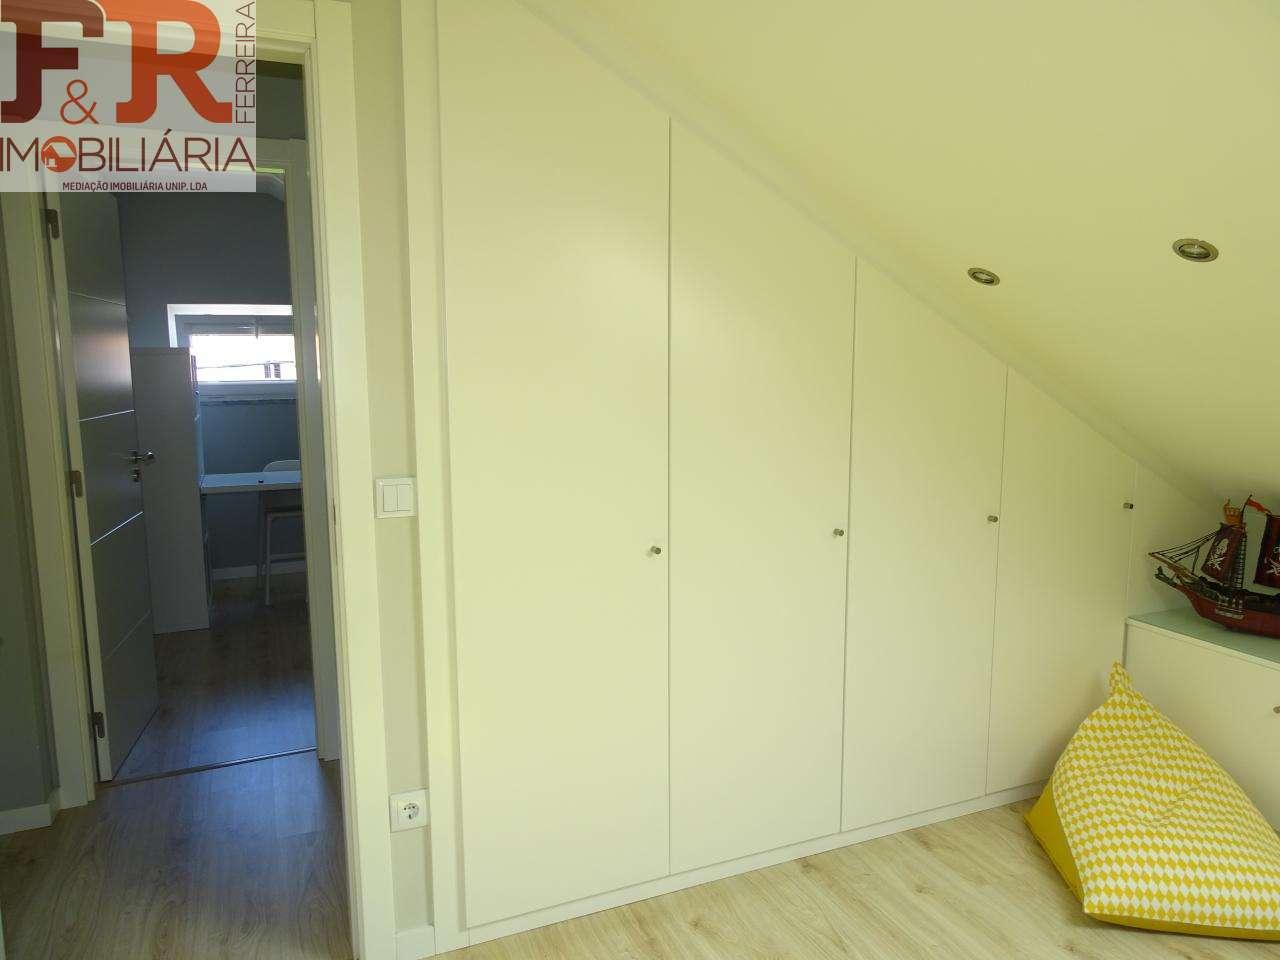 Apartamento para comprar, Quinta do Conde, Setúbal - Foto 16